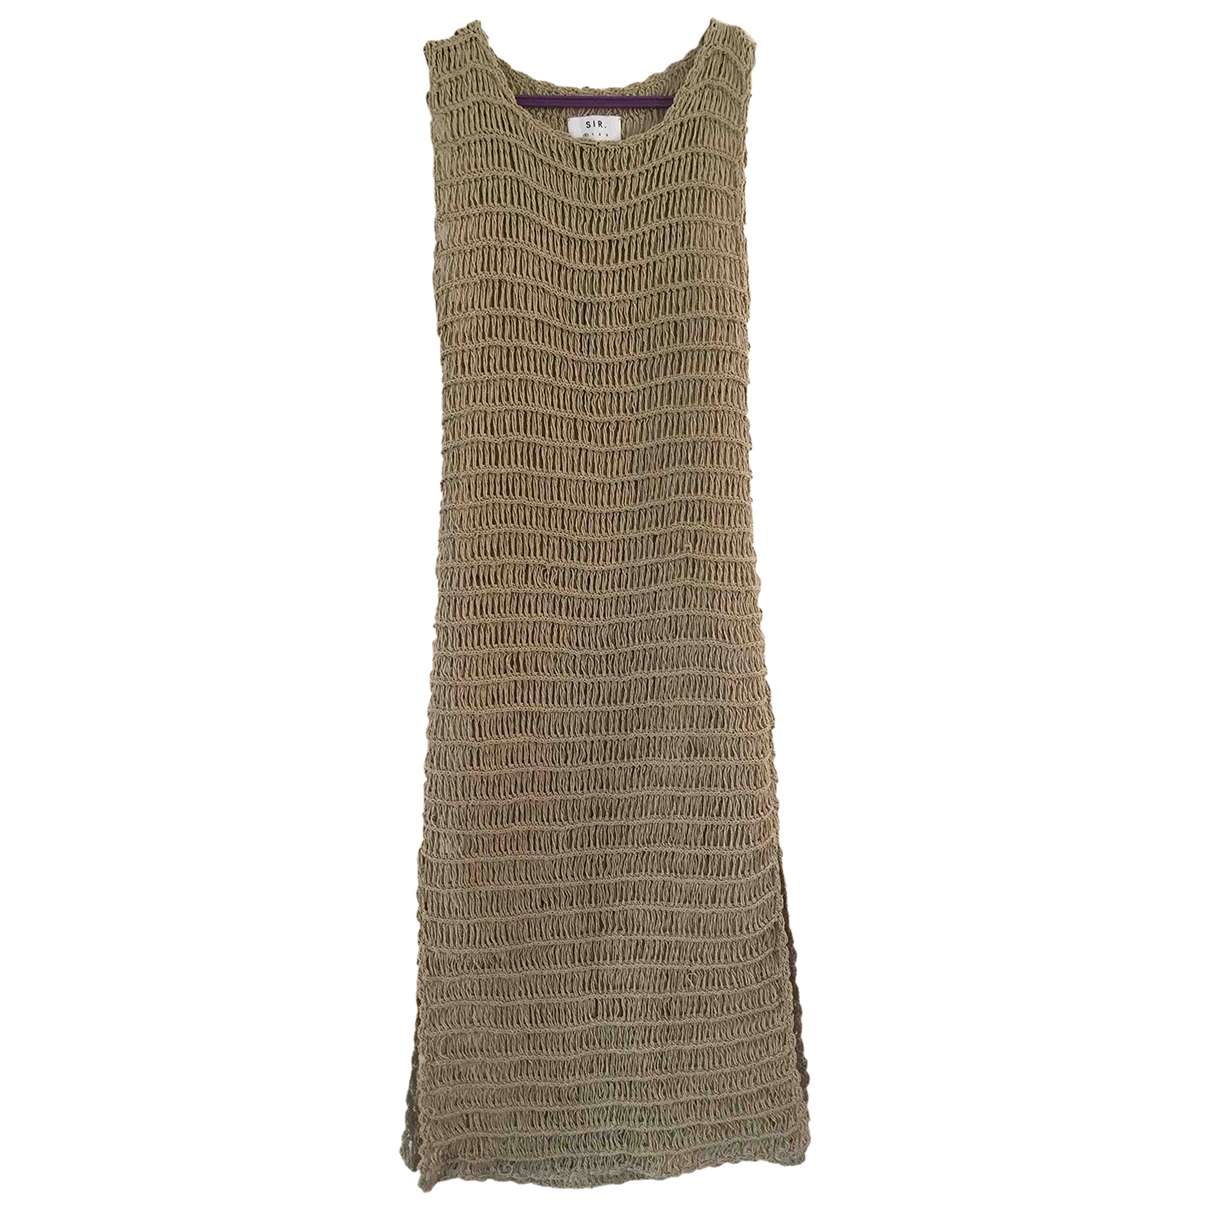 Sir \N Beige Cotton dress for Women 0 0-5